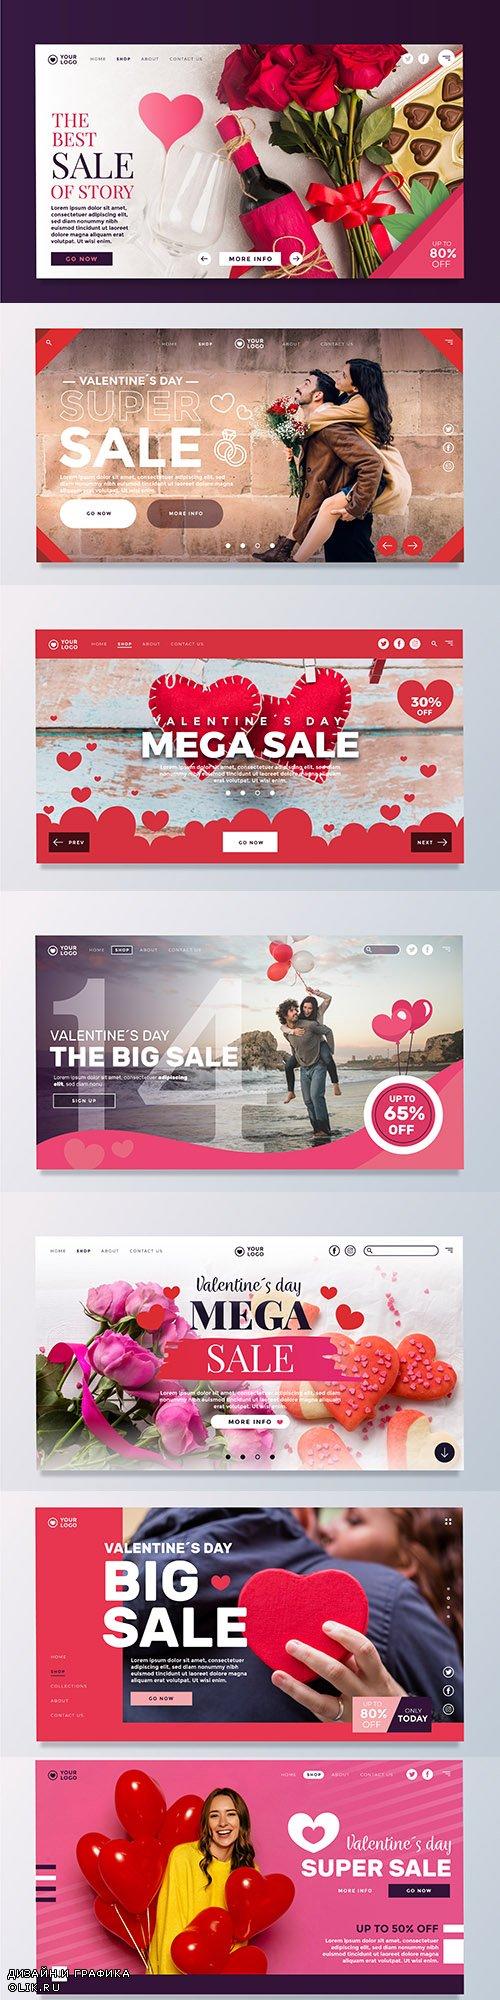 Valentine's Day festive super sales illustrations